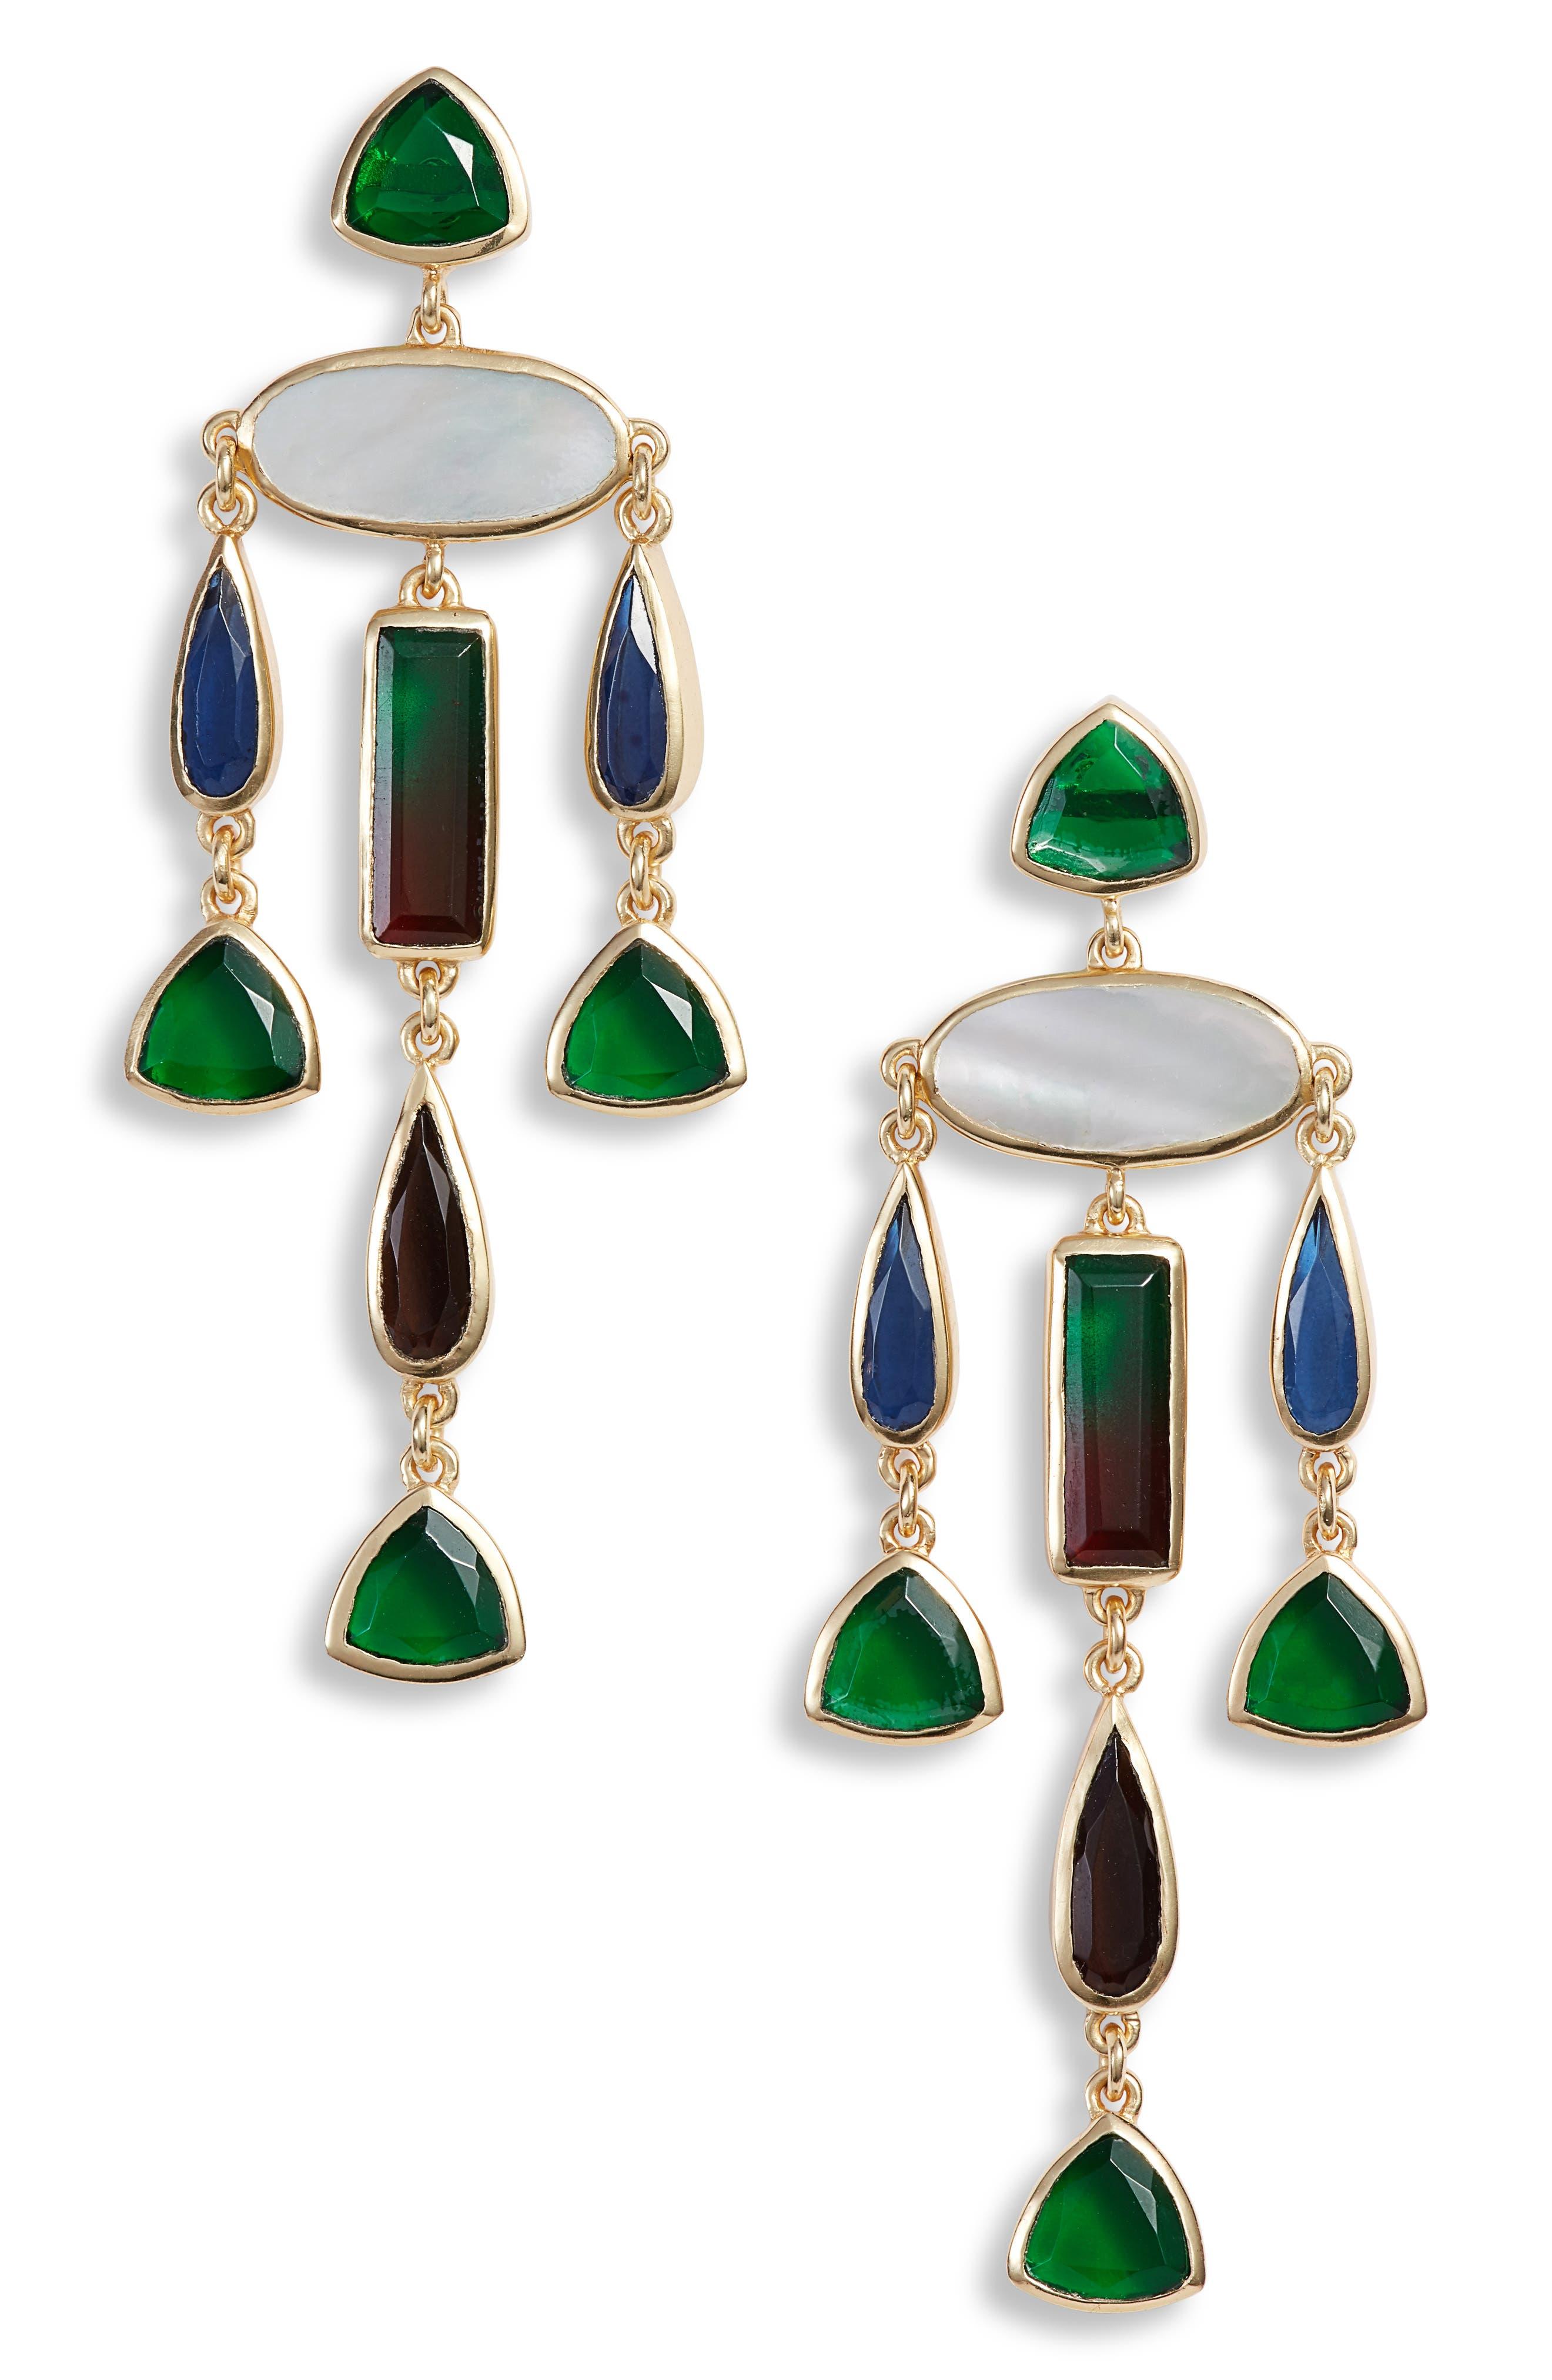 Image of Sole Society Chandelier Earrings